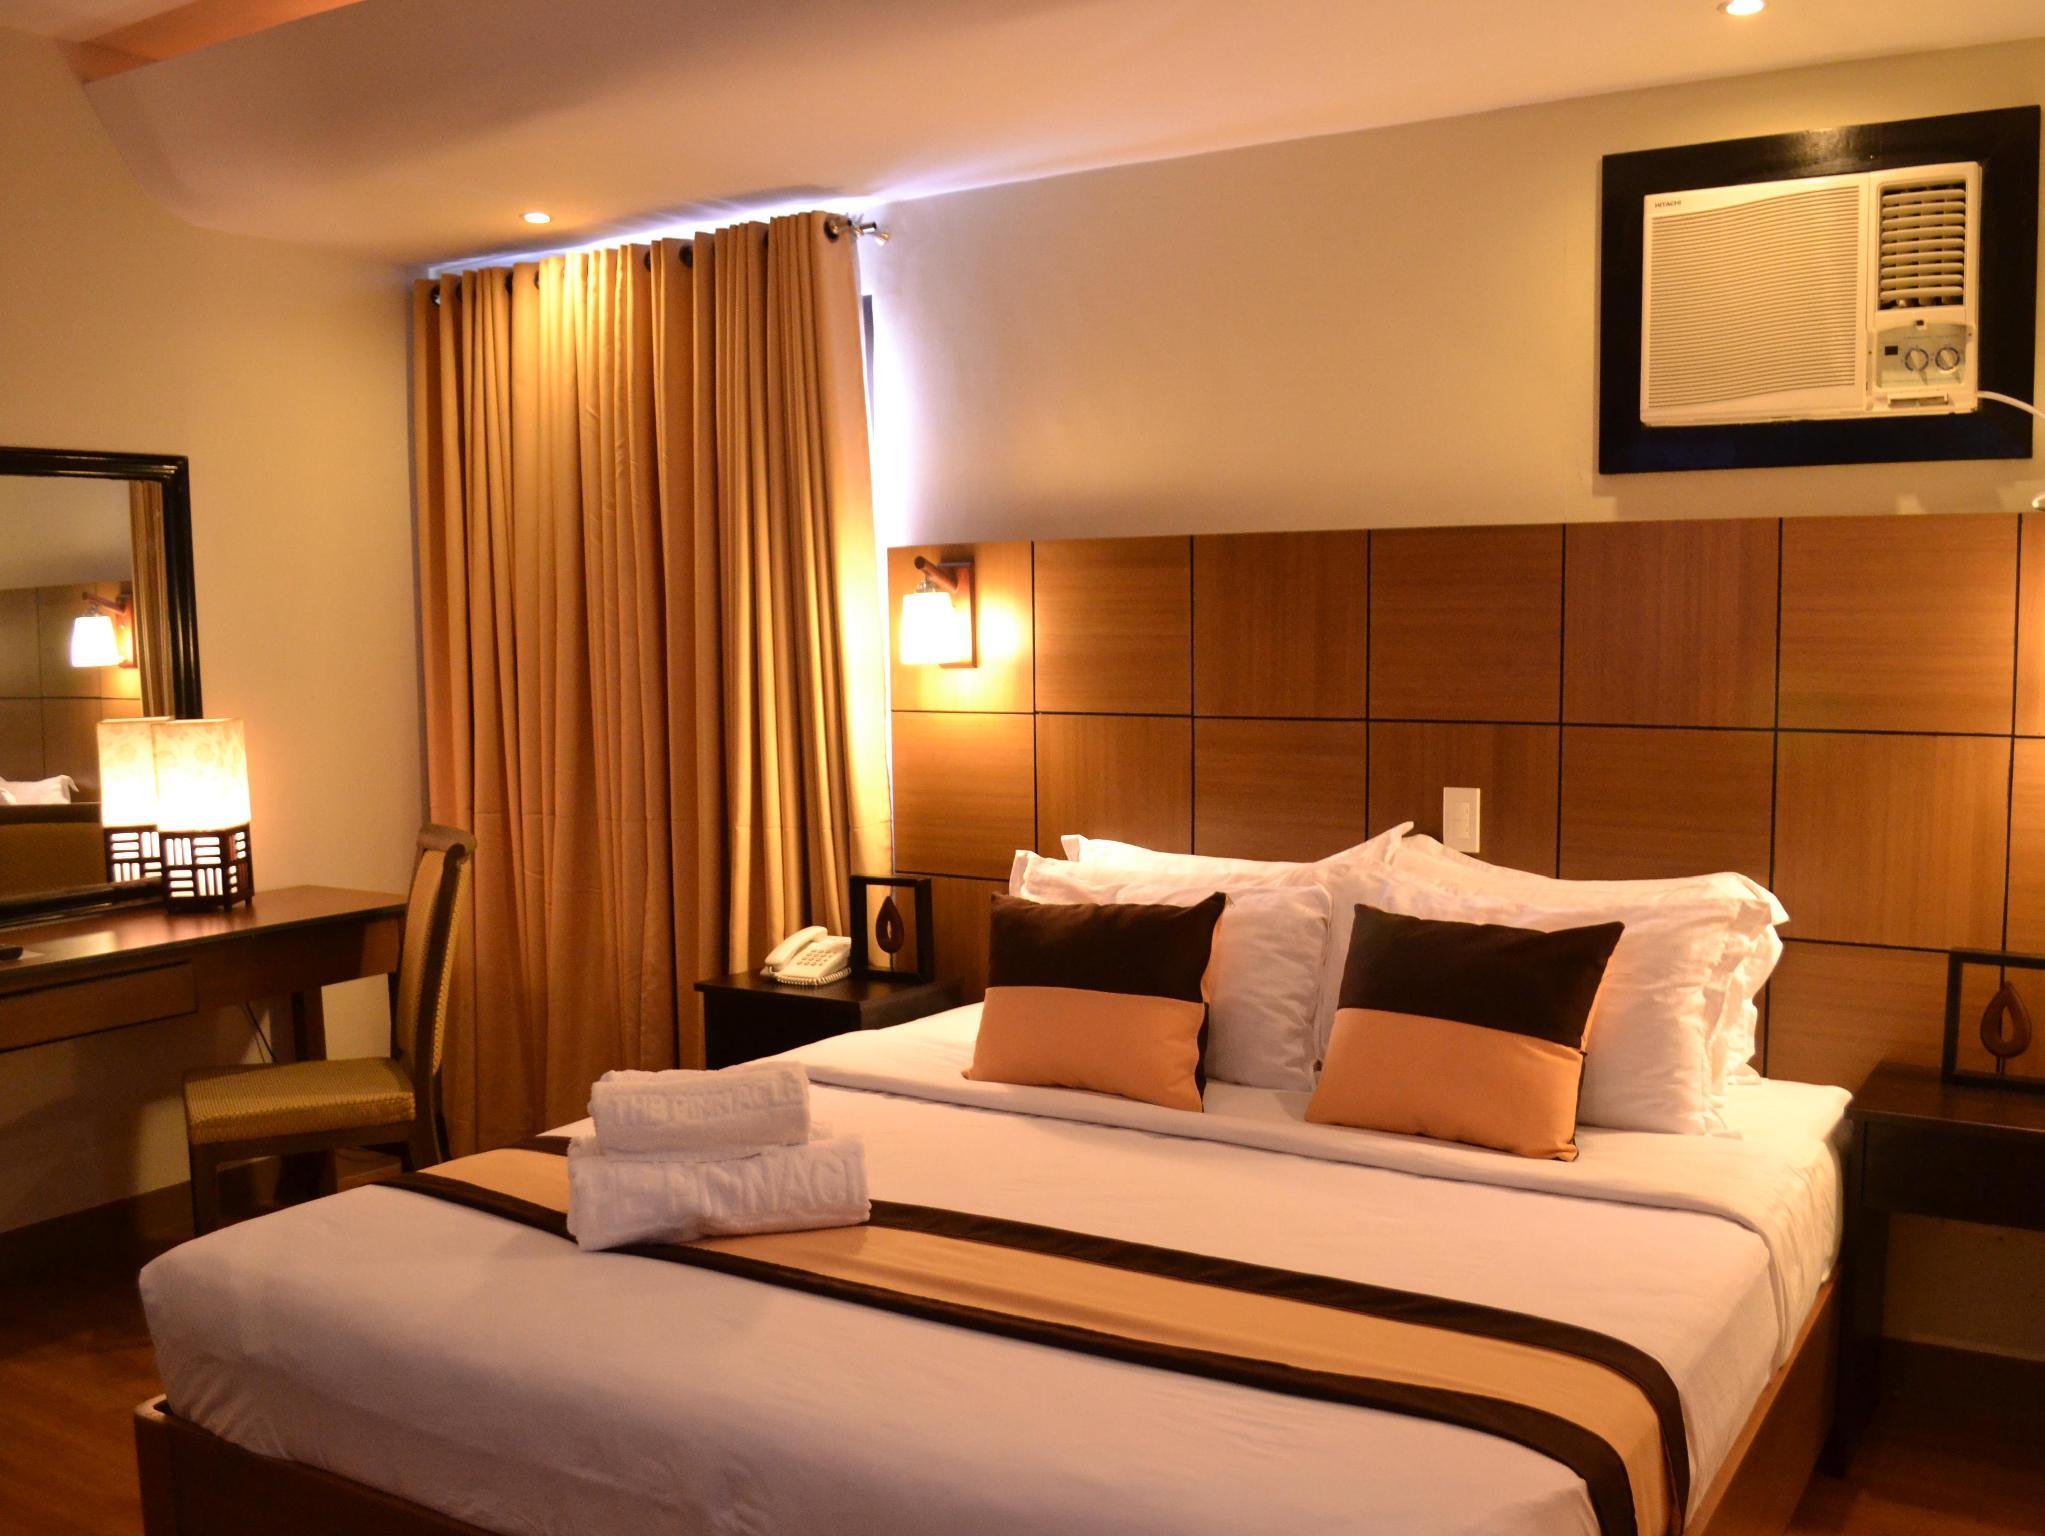 Hotel Uno Davao Room Rates